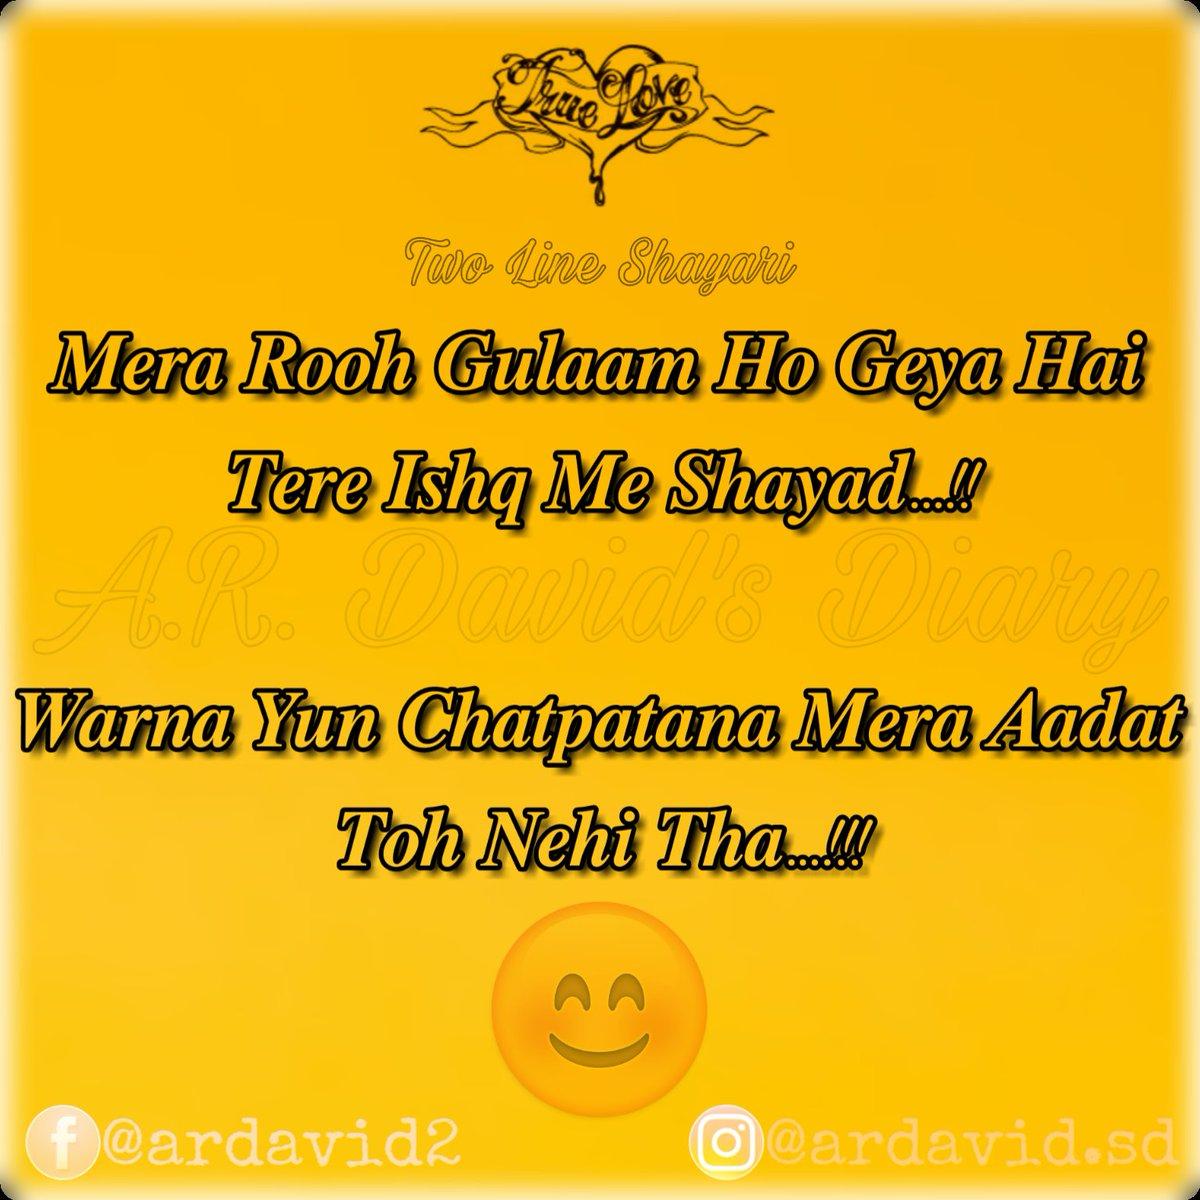 Love is a Journey from LIFE to DEATH...!!!  #sd_creations #shayar #shayari #shayaries #sadshayar #nafrat #attitude #breakup #urdu #hindi #ghazal #trending #writer #2lineshayari #mohabbat #ghalib #shayaris #hindipoetry #tanha #ishq #shayarilover #india #urdulines #urdupoetry #dardpic.twitter.com/25qCQ0oXYR